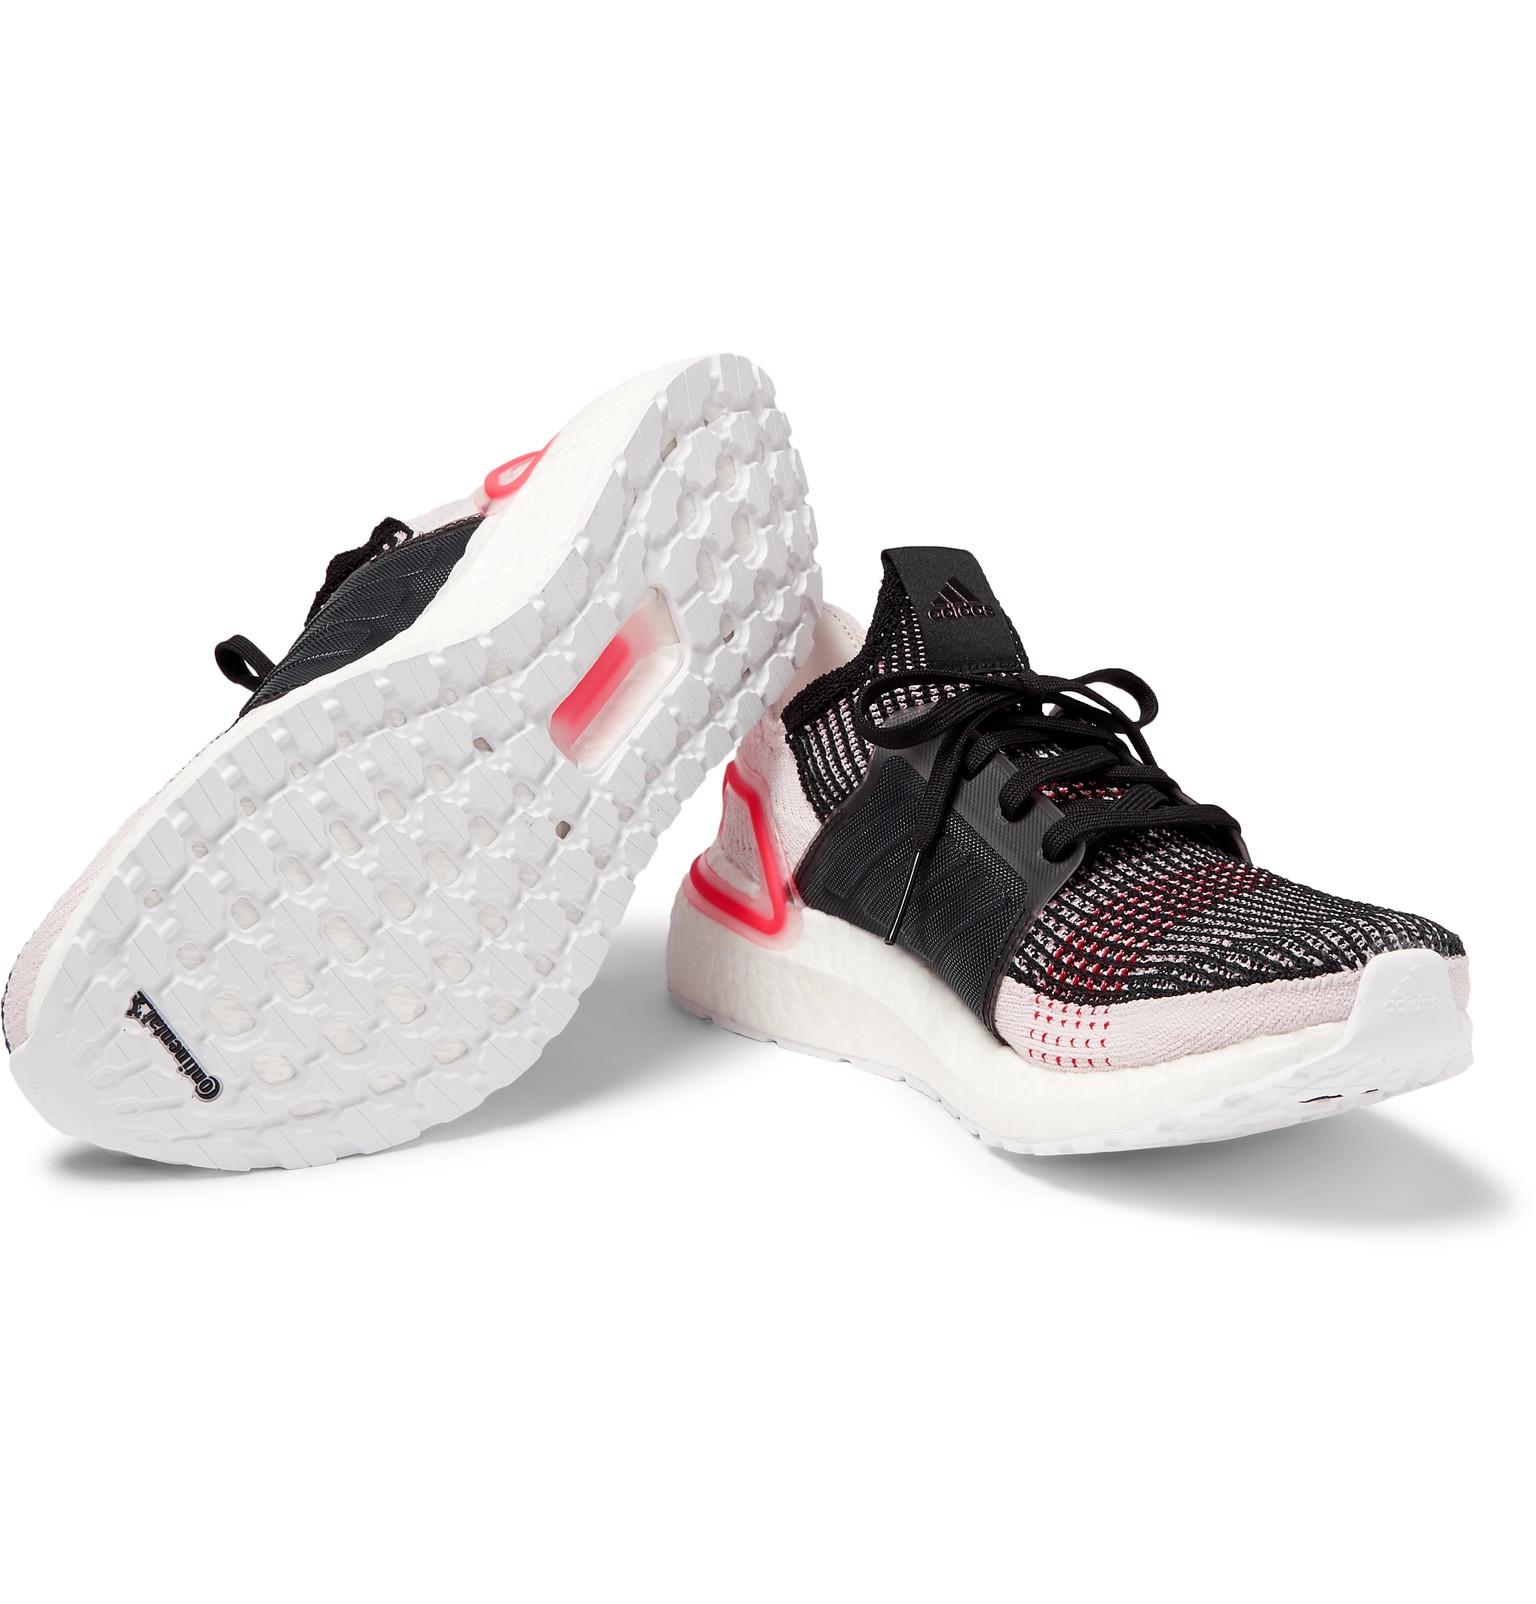 premium selection 6cc85 86e2e adidas Originals - UltraBOOST 19 Rubber-Trimmed Primeknit Sn